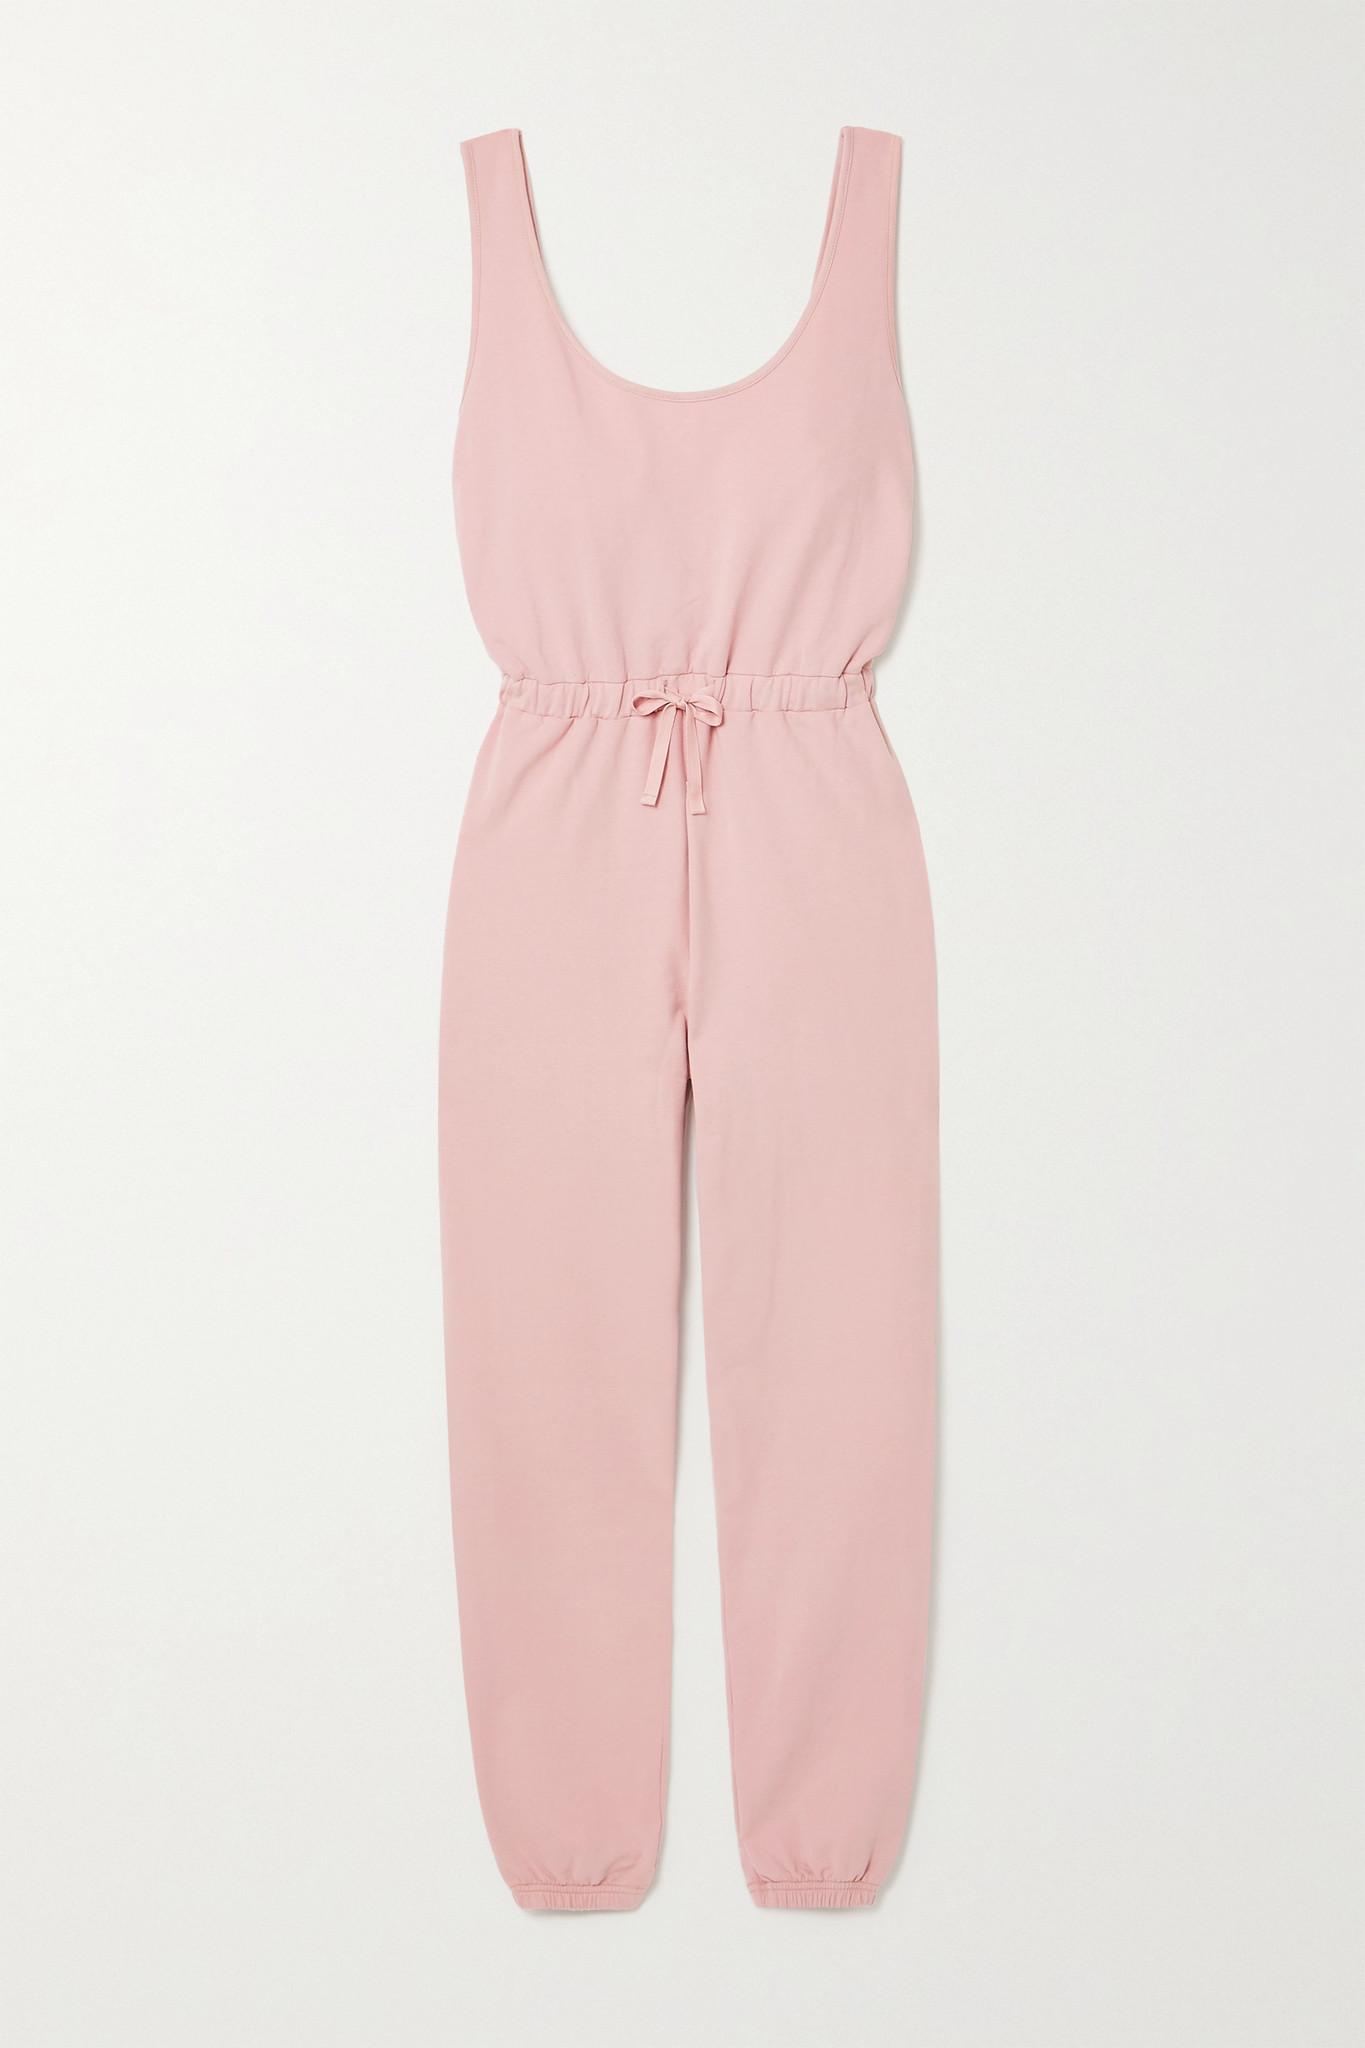 NINETY PERCENT - + Net Sustain Brushed Organic Cotton-jersey Jumpsuit - Pink - small